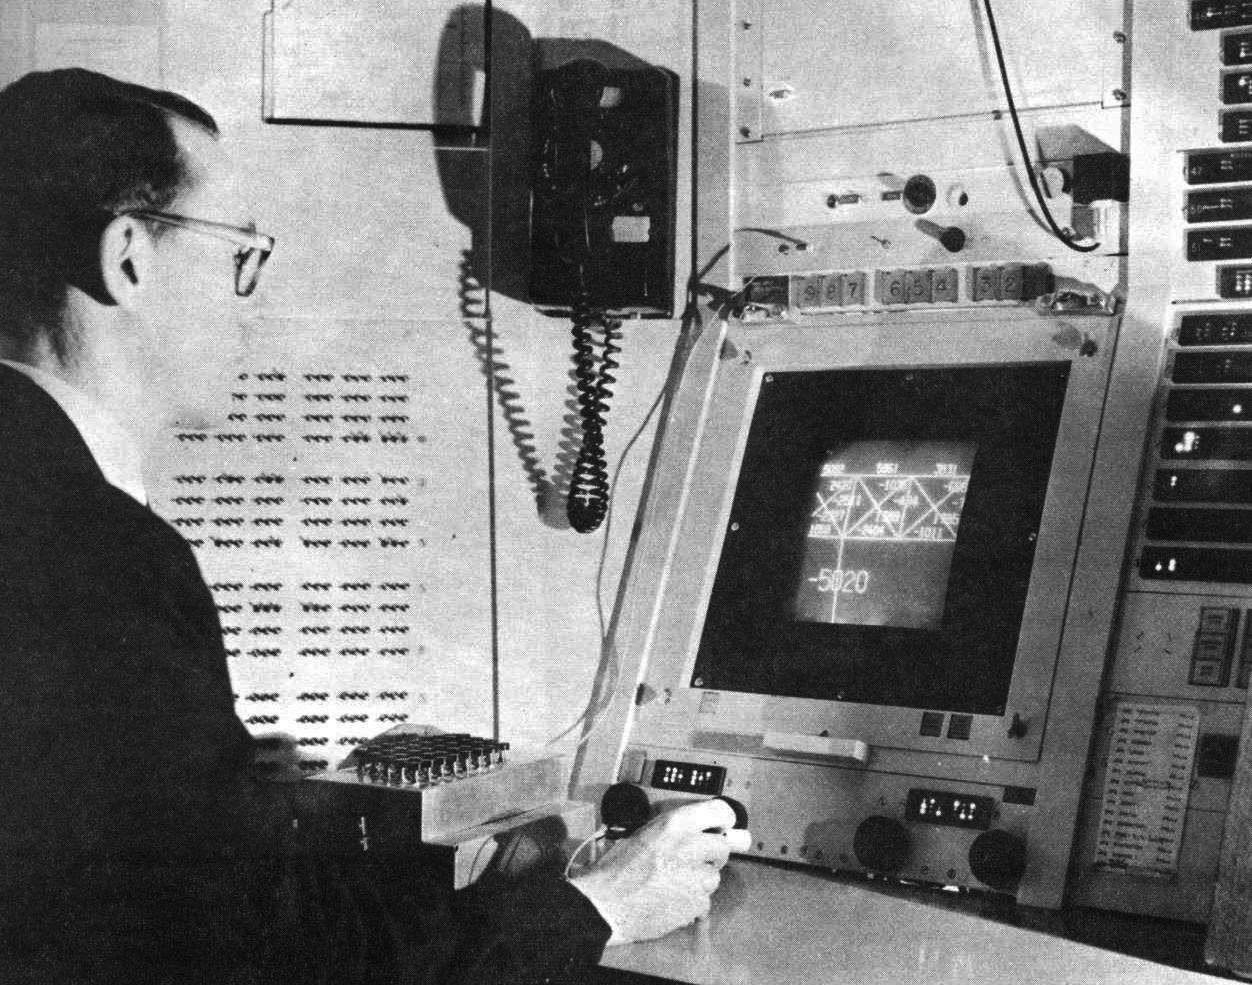 Figure 2 – Ivan Sutherland's Sketchpad  (1963)